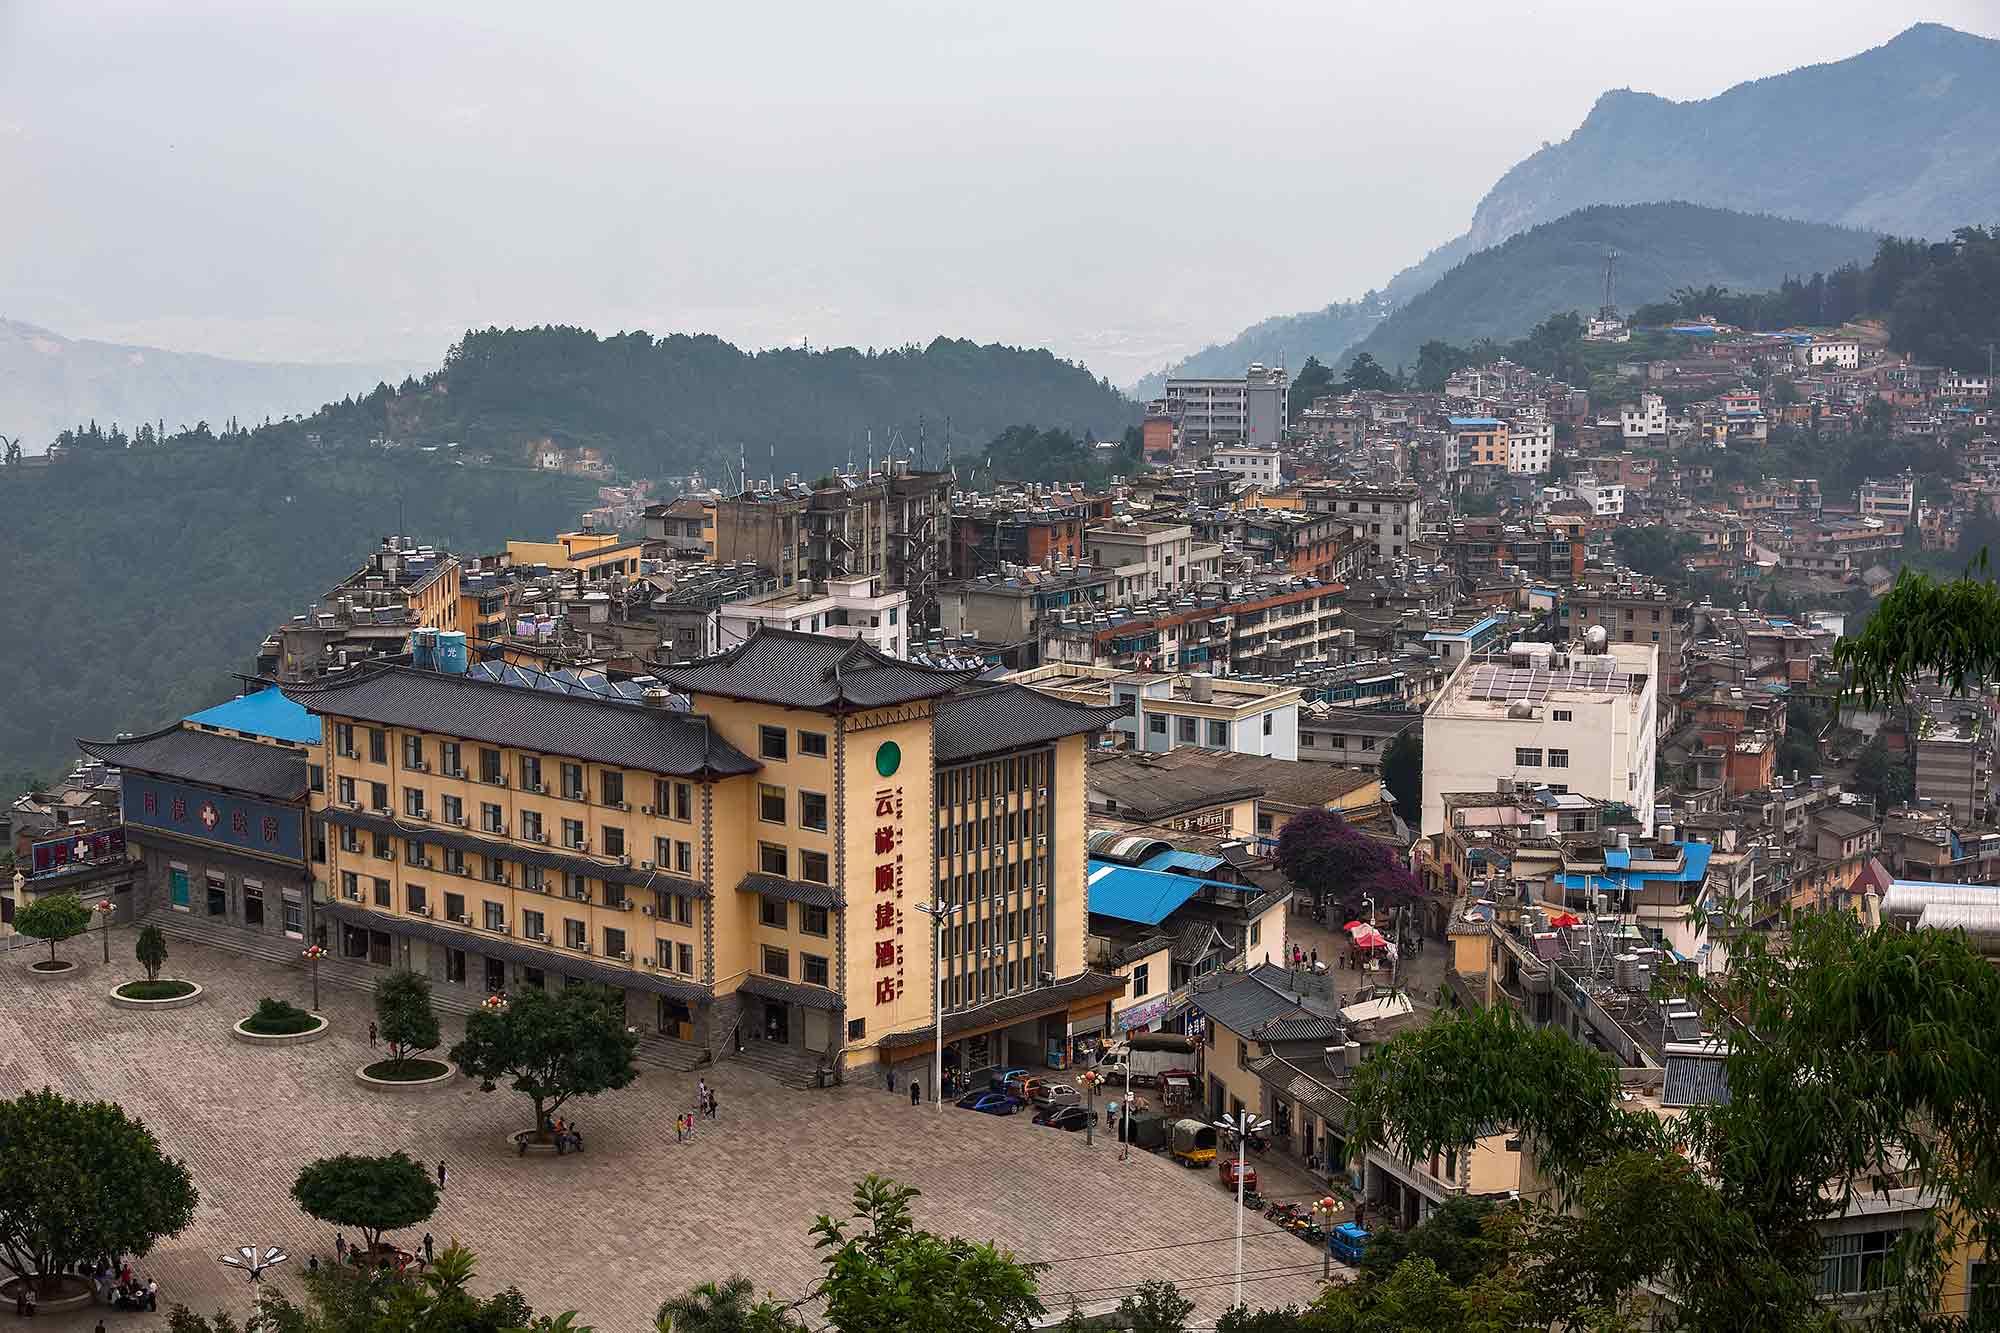 The city of Xinjie in Yunnan. © Ulli Maier & Nisa Maier